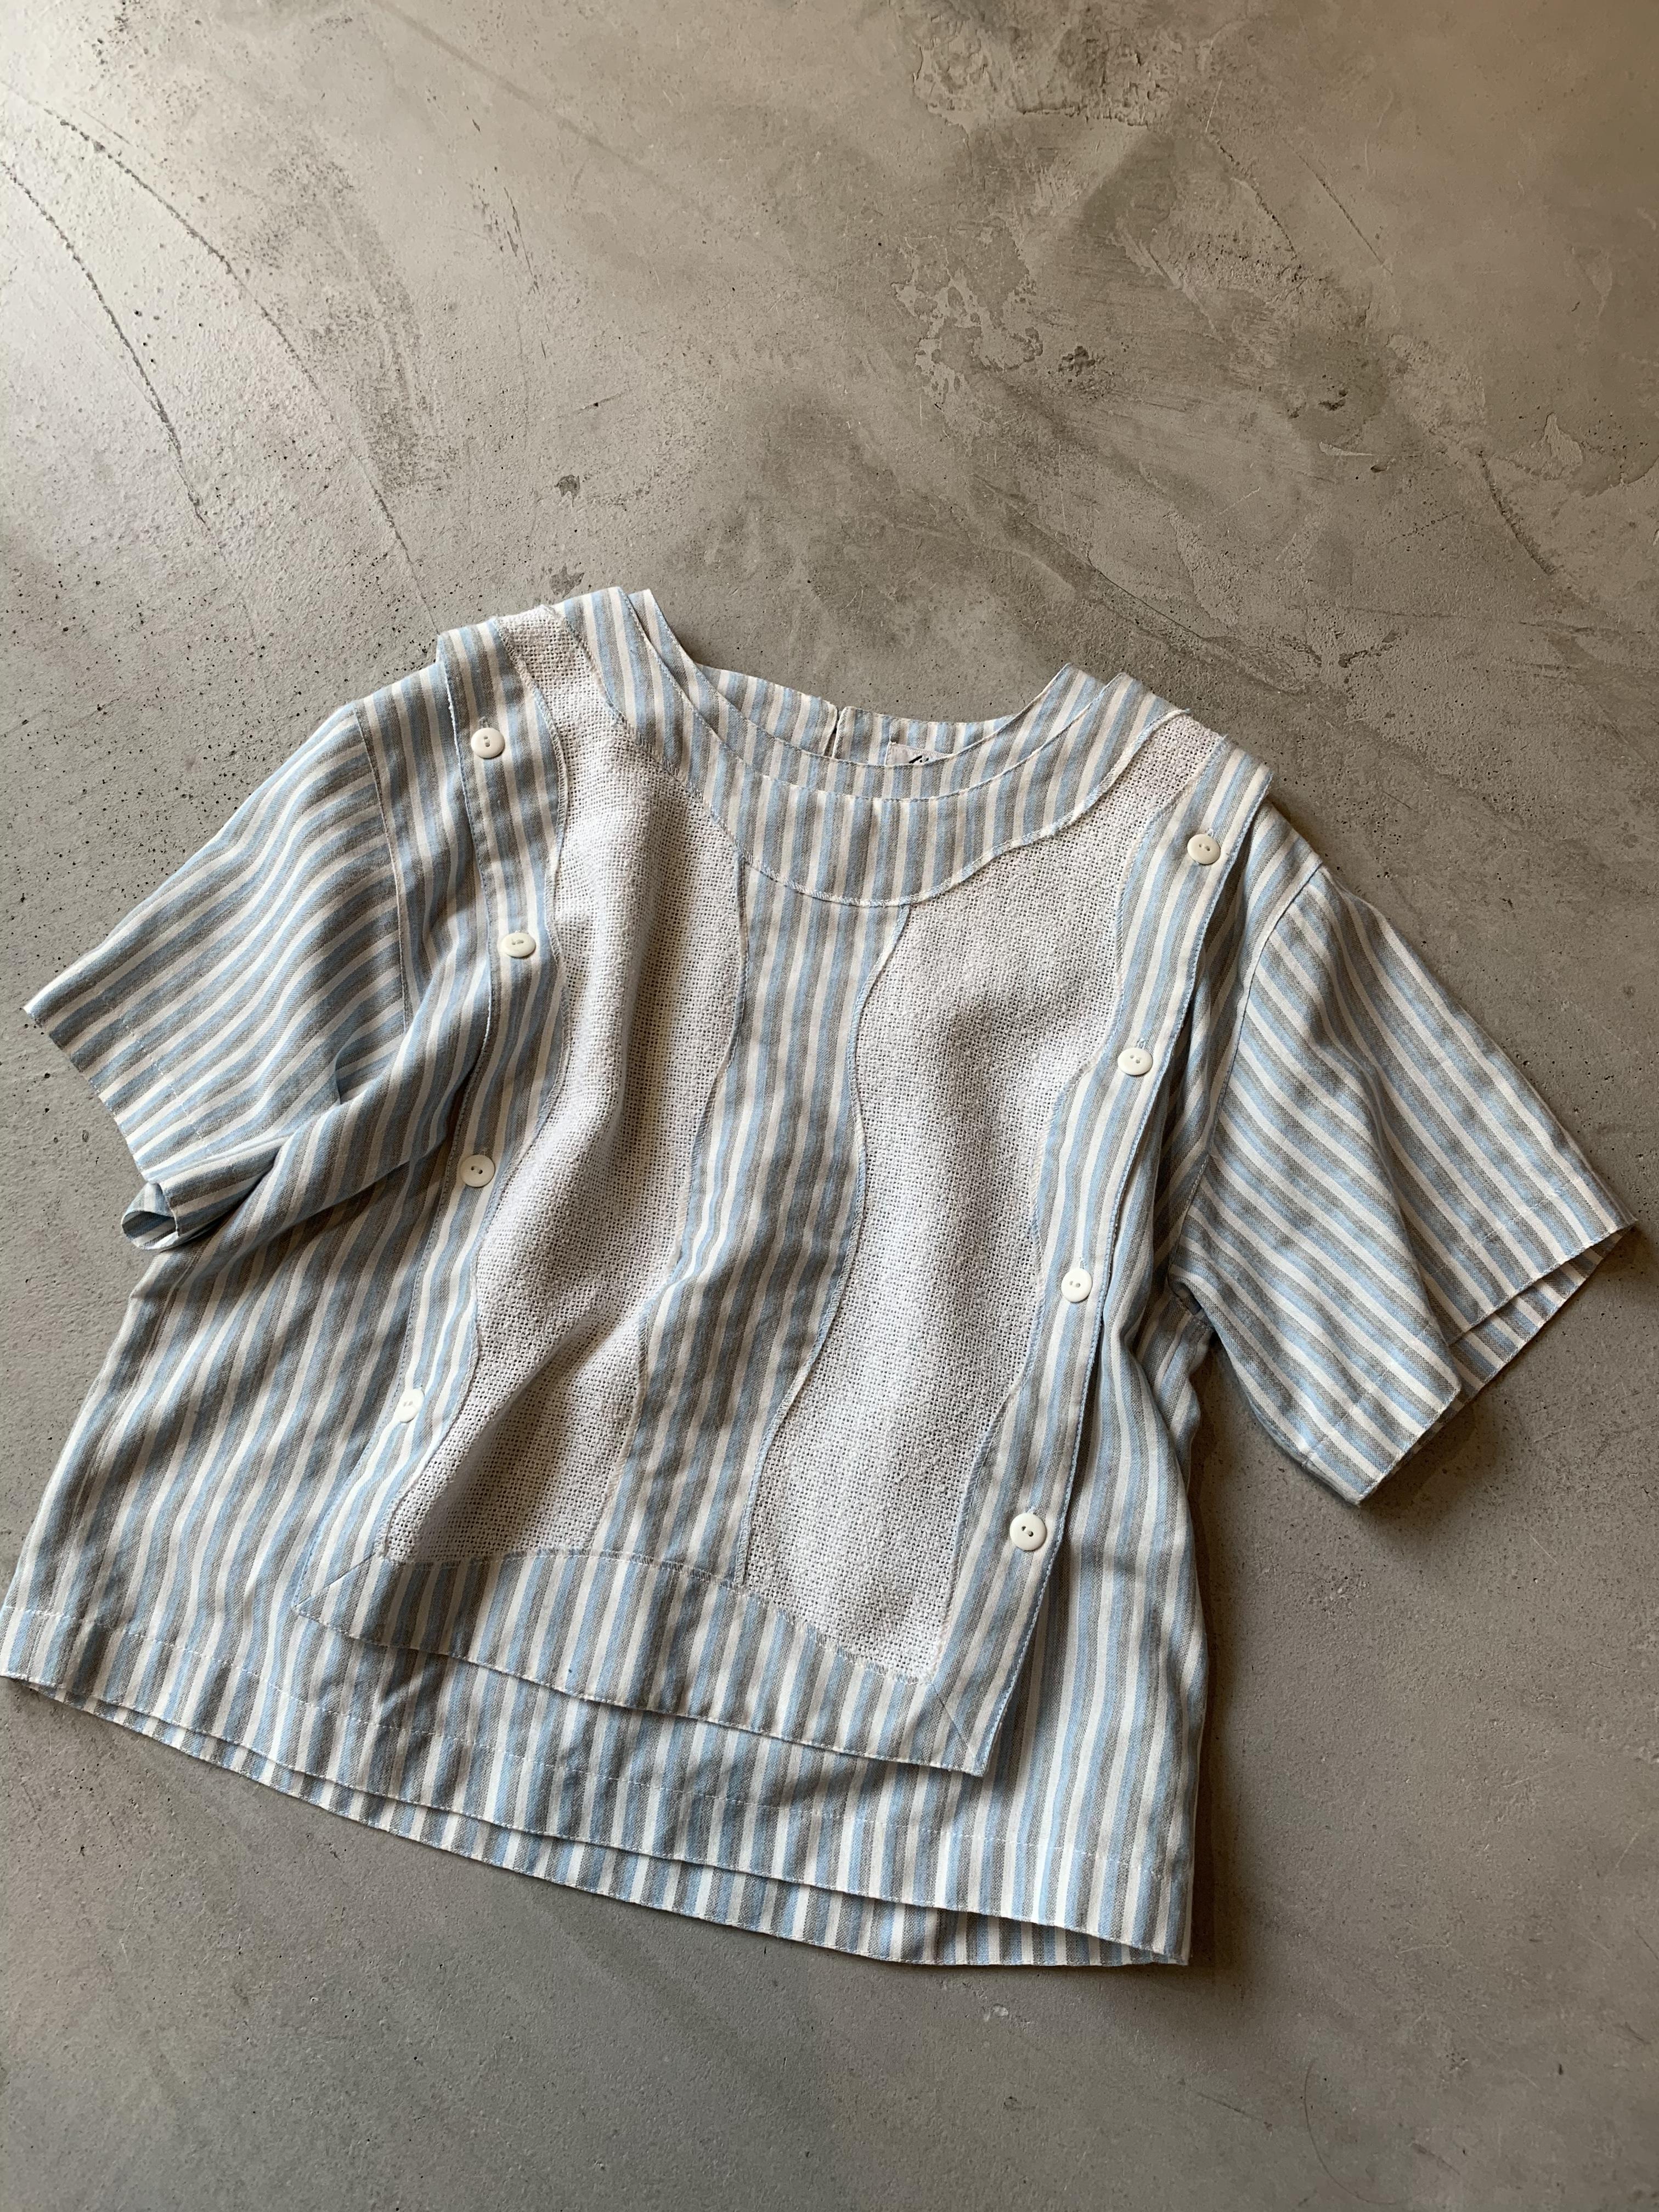 vintage strip blouse